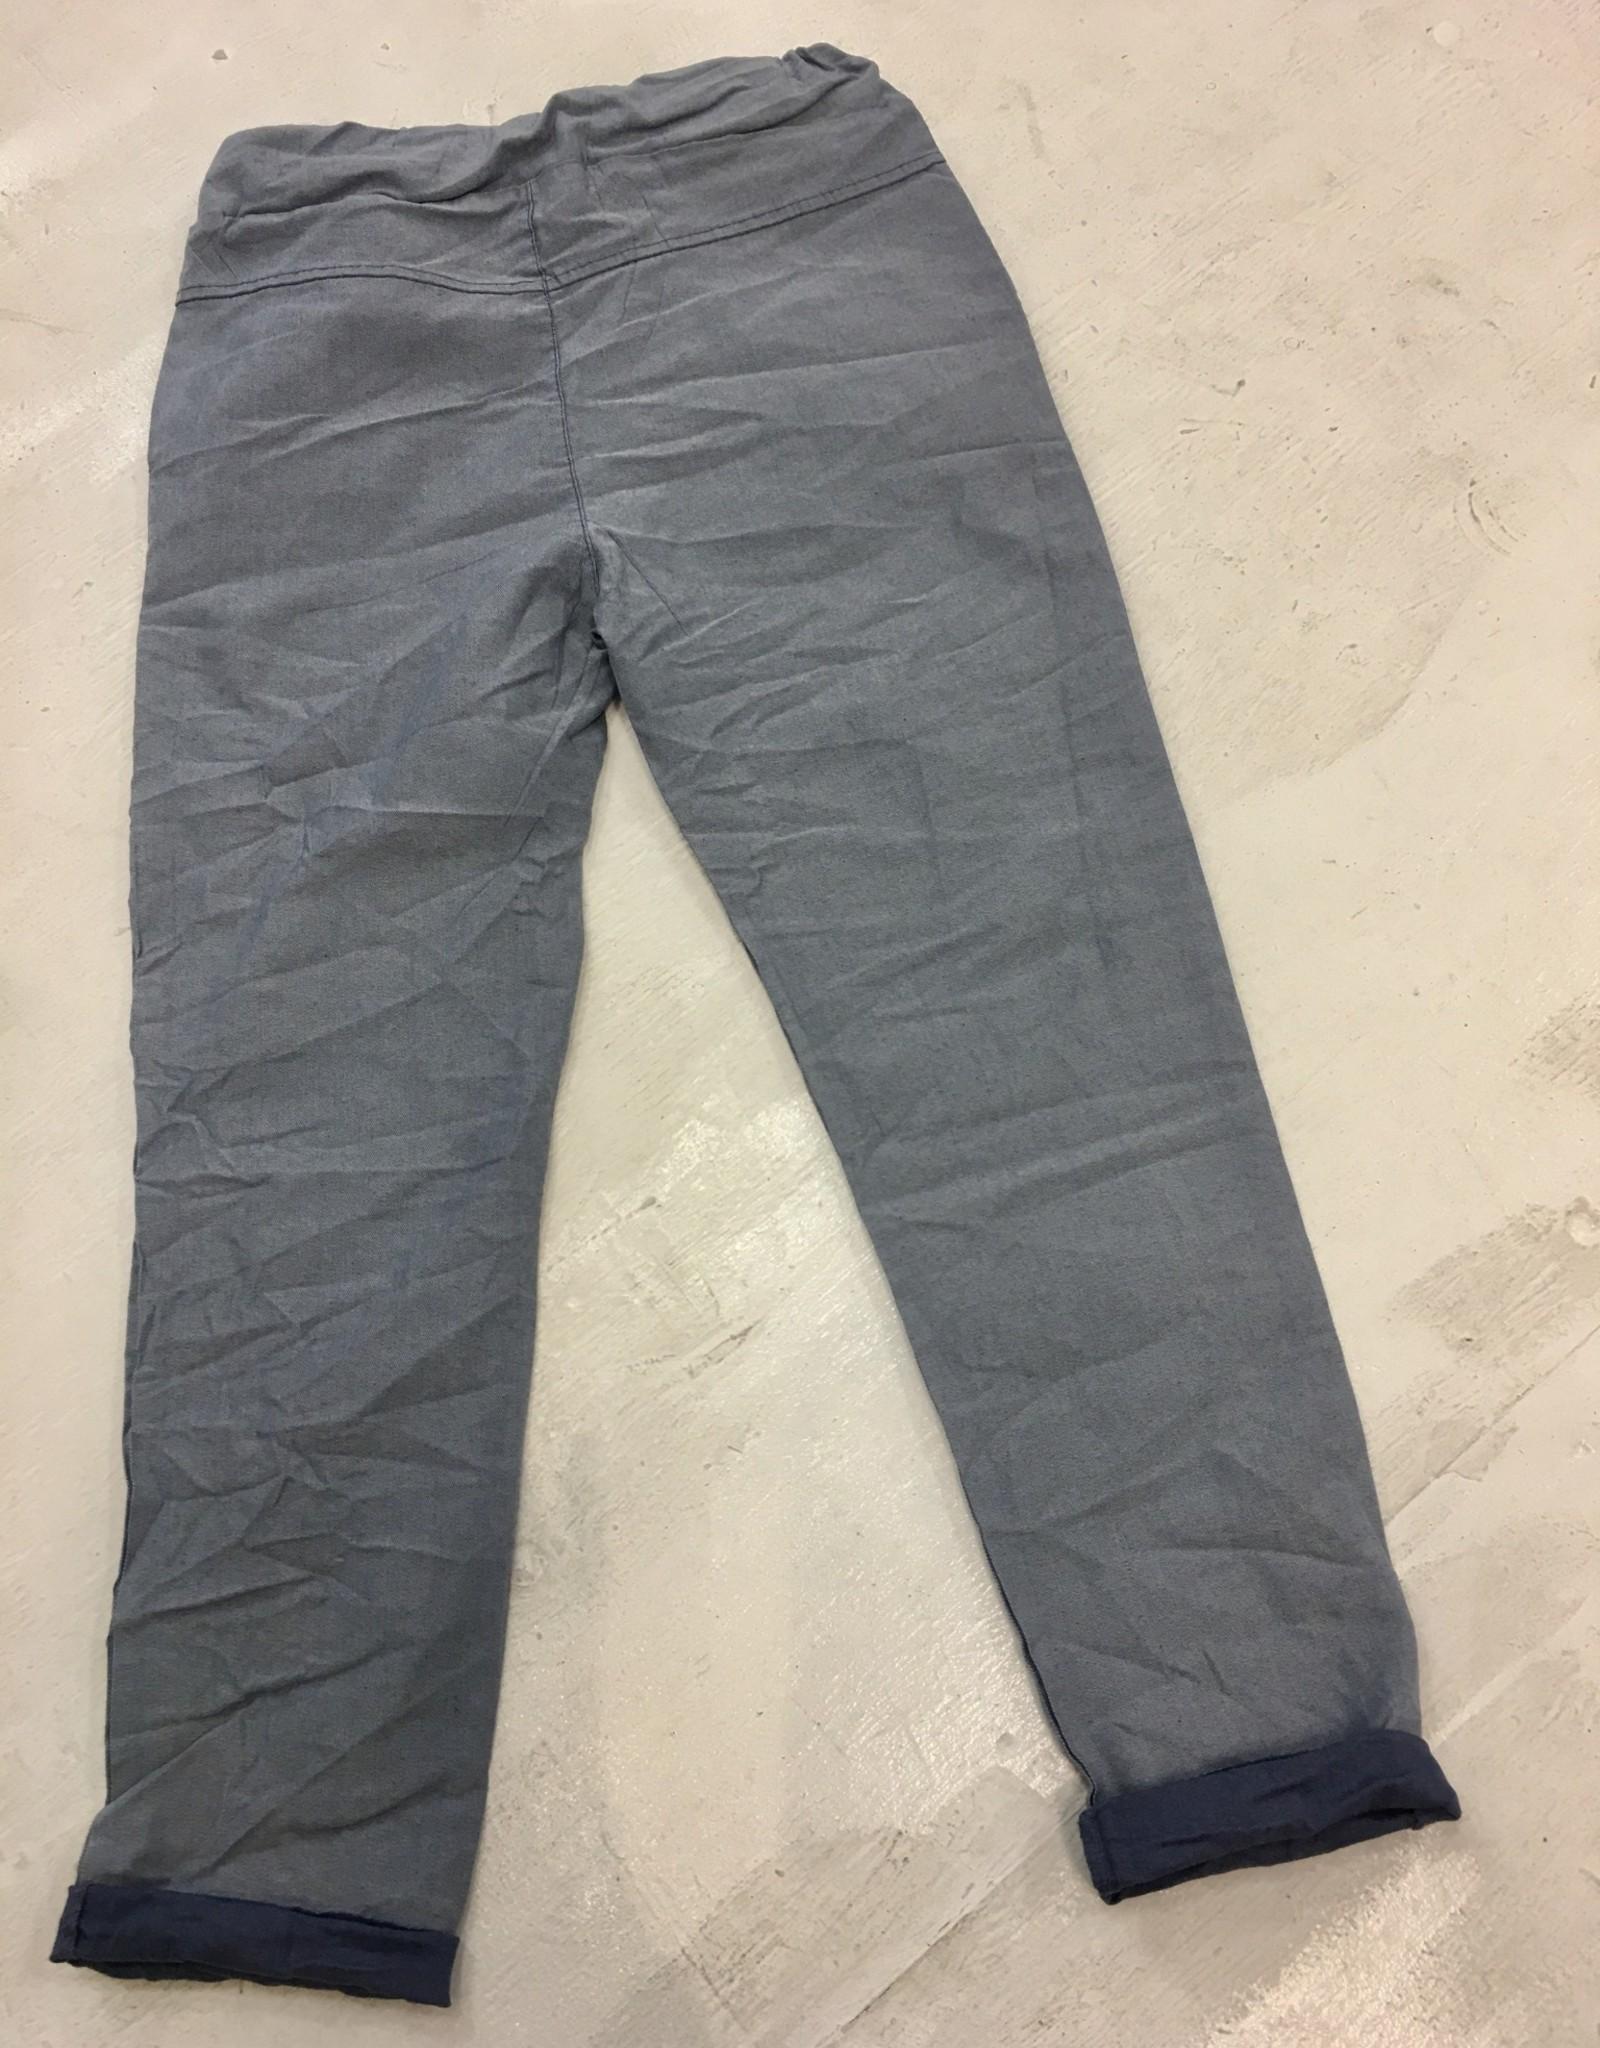 Bella Amore 7558 jeans